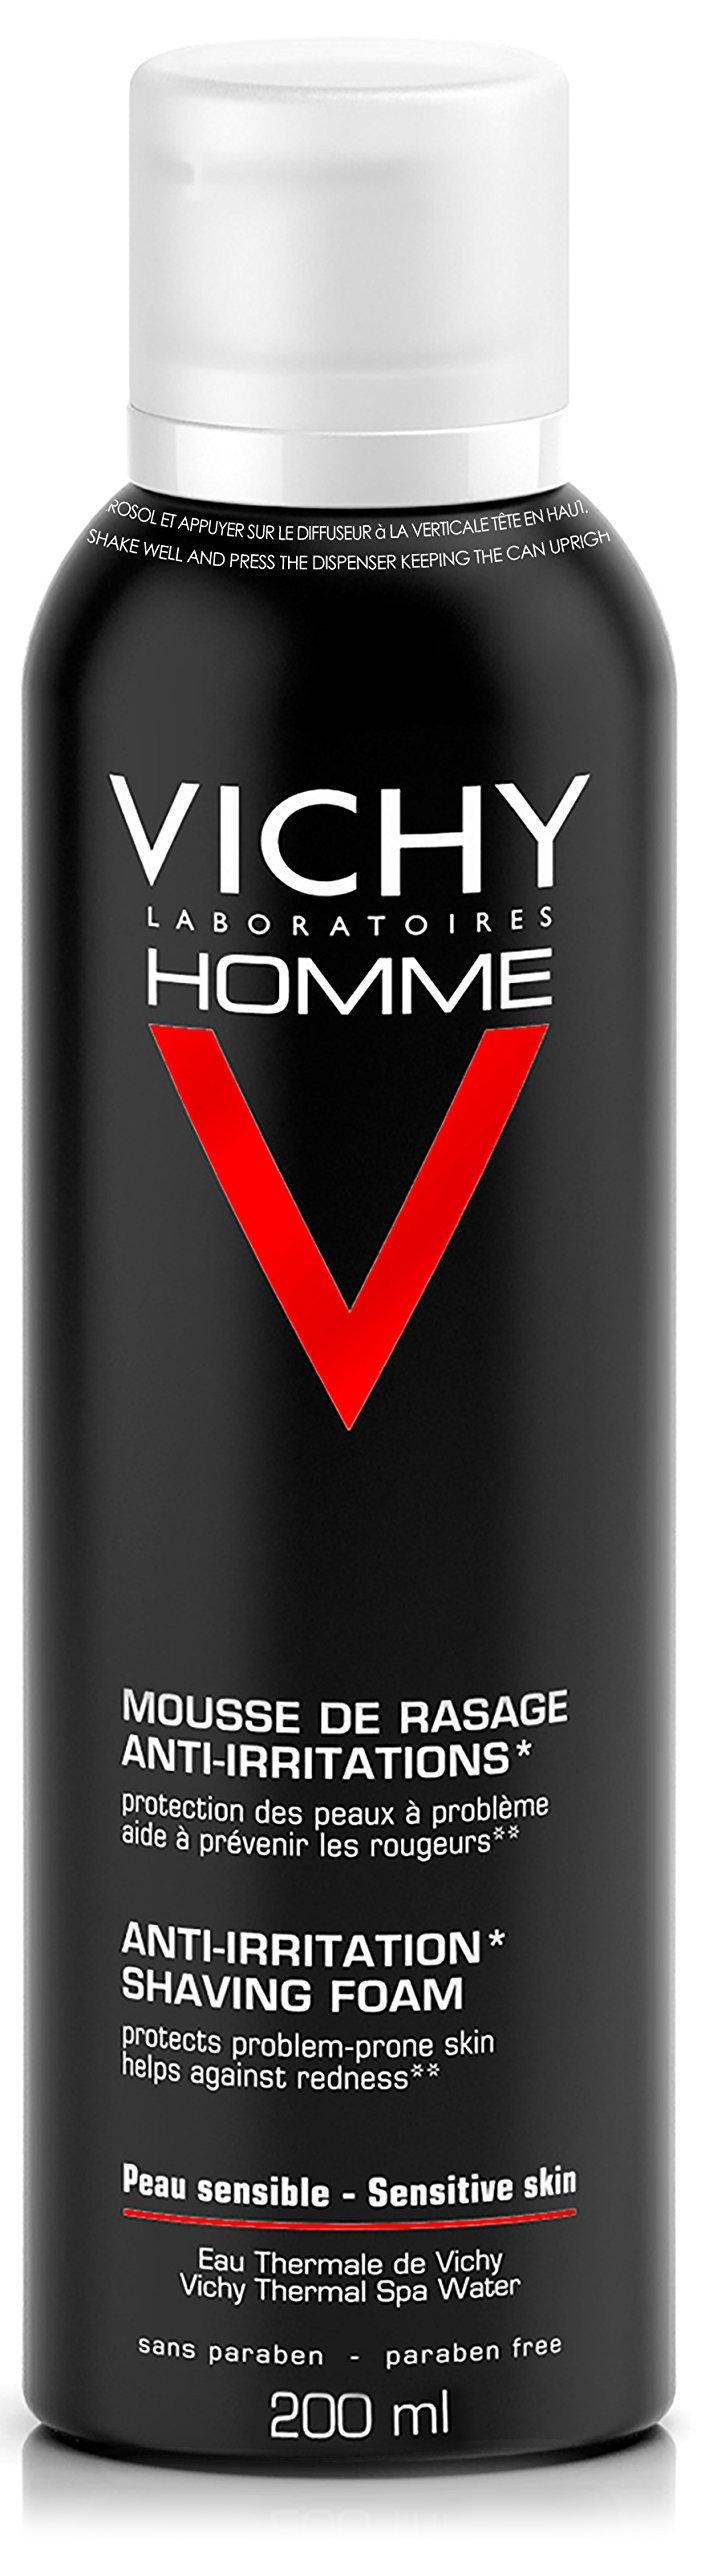 Vichy Homme Anti-Irritation Shaving Foam, 7.06 Oz.